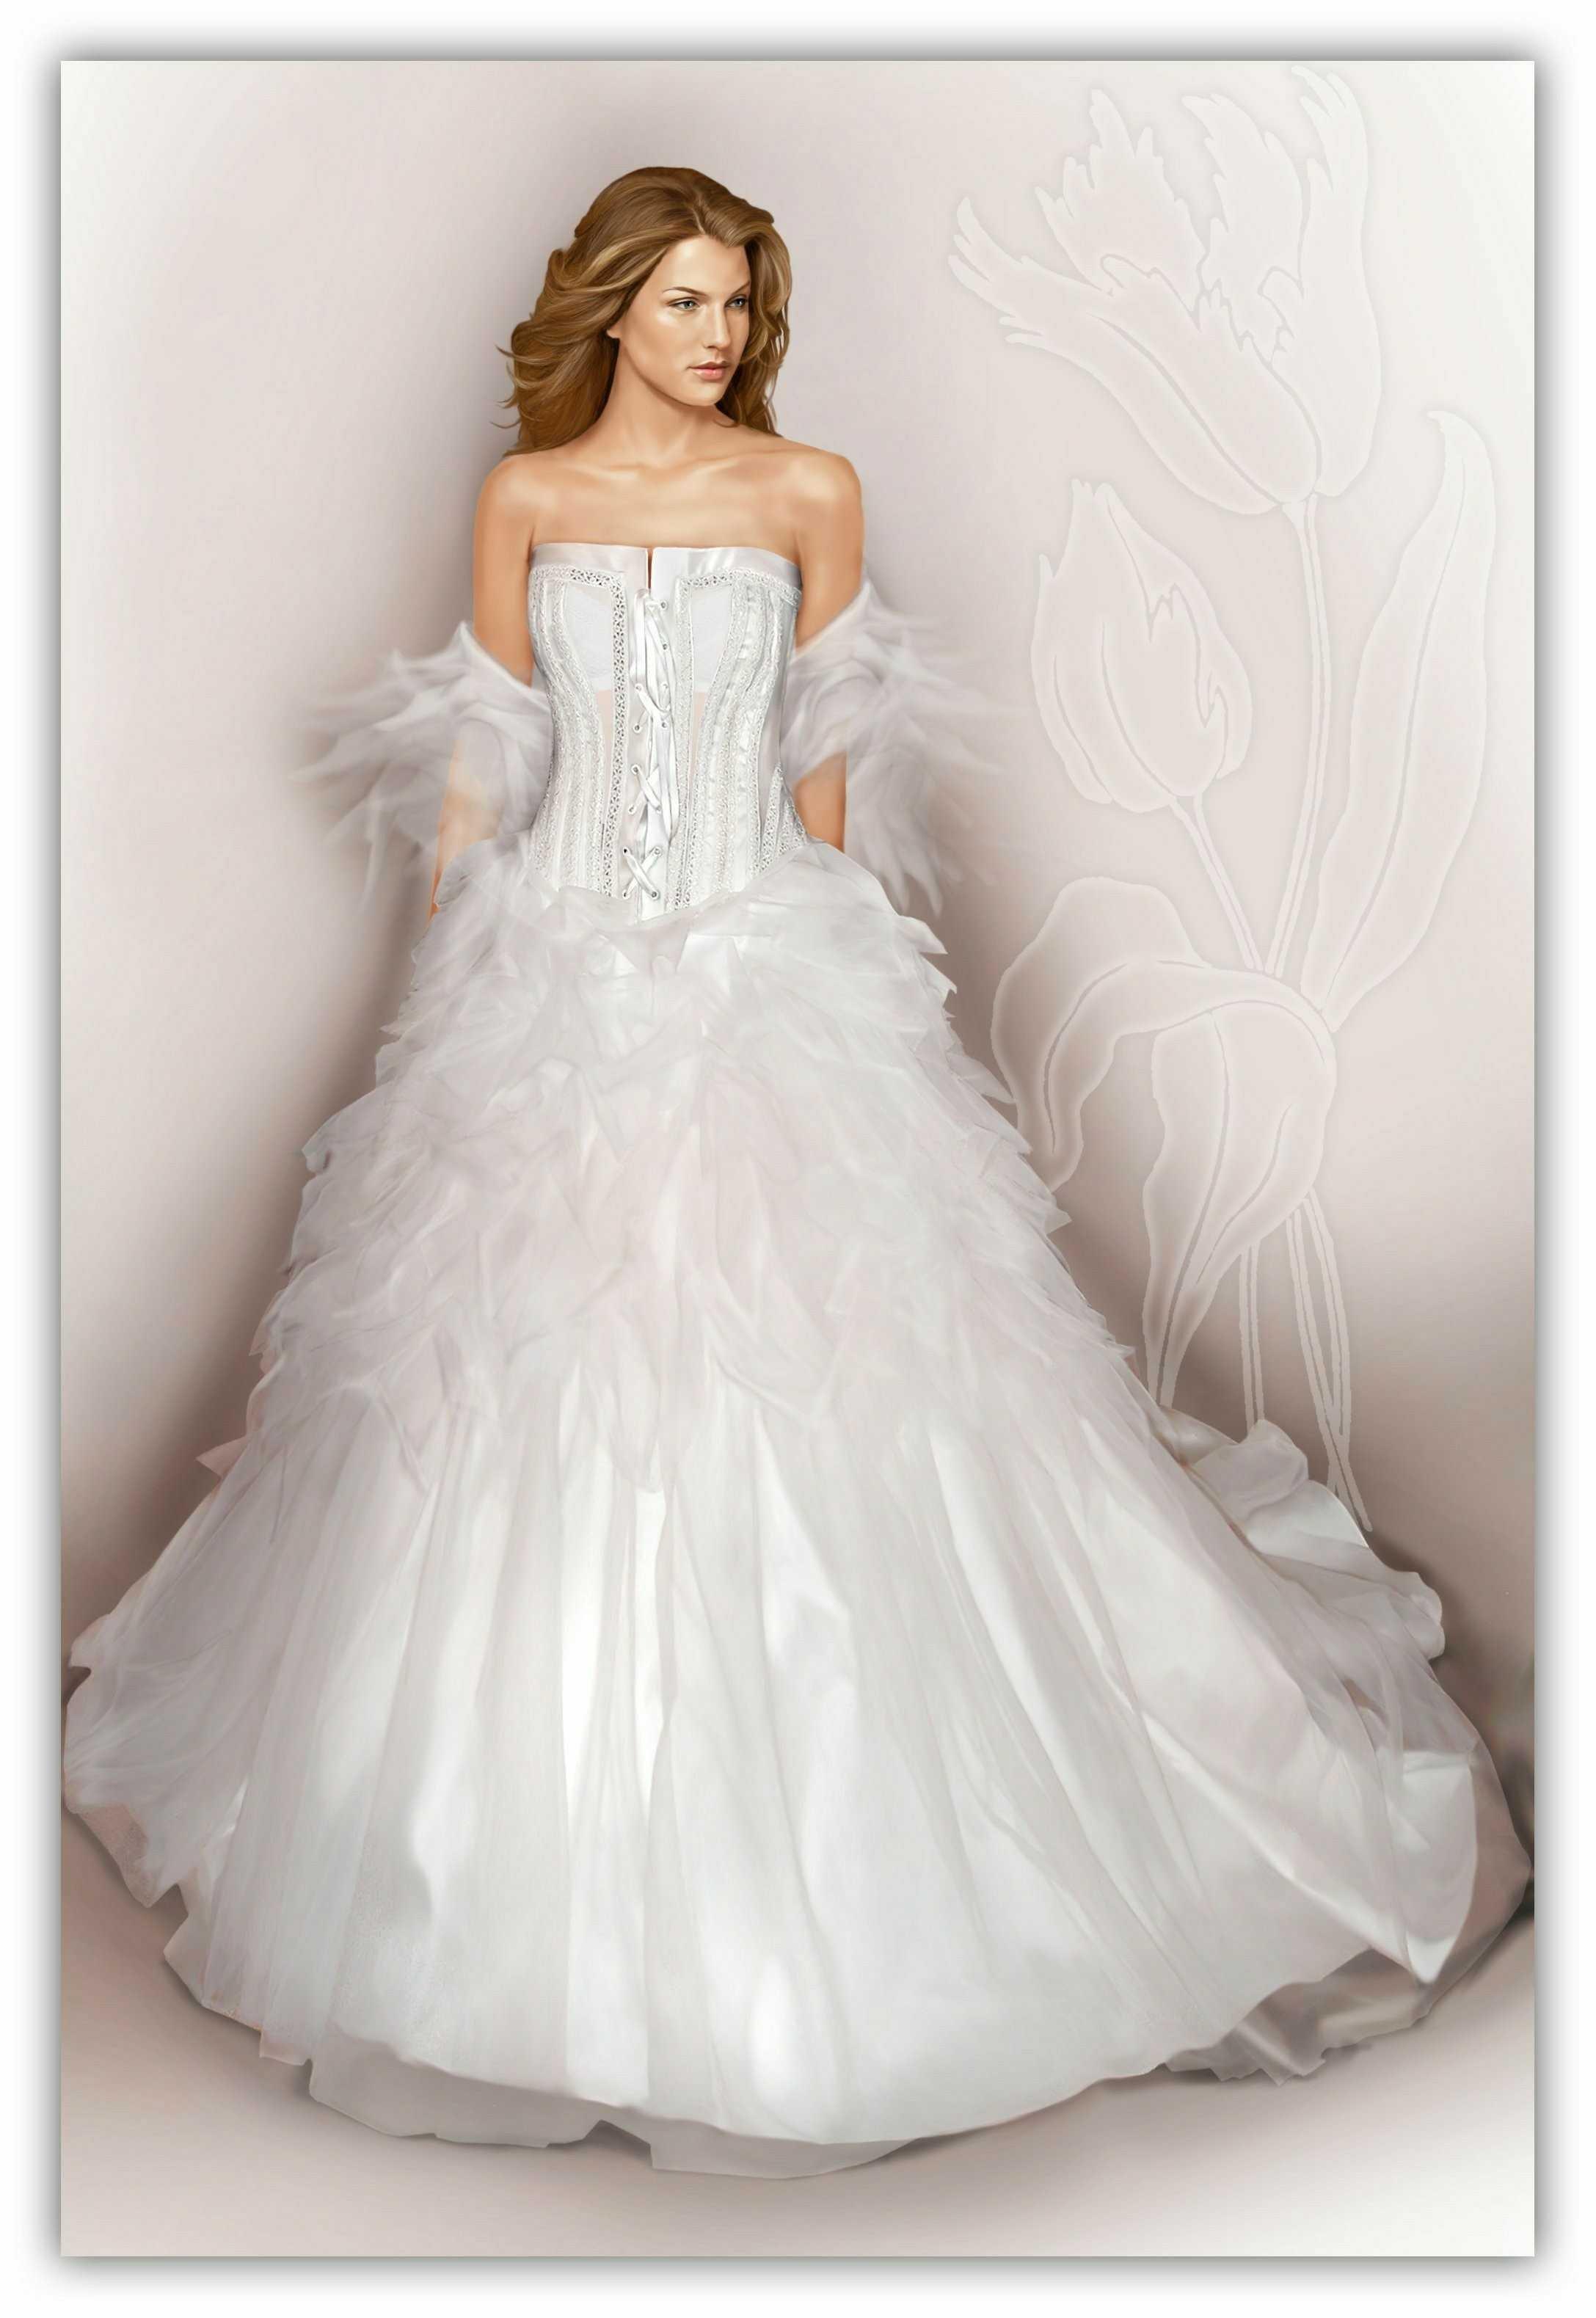 Wedding Dress Patterns Free Wedding Dress Sewing Pattern 2001 Made to Measure